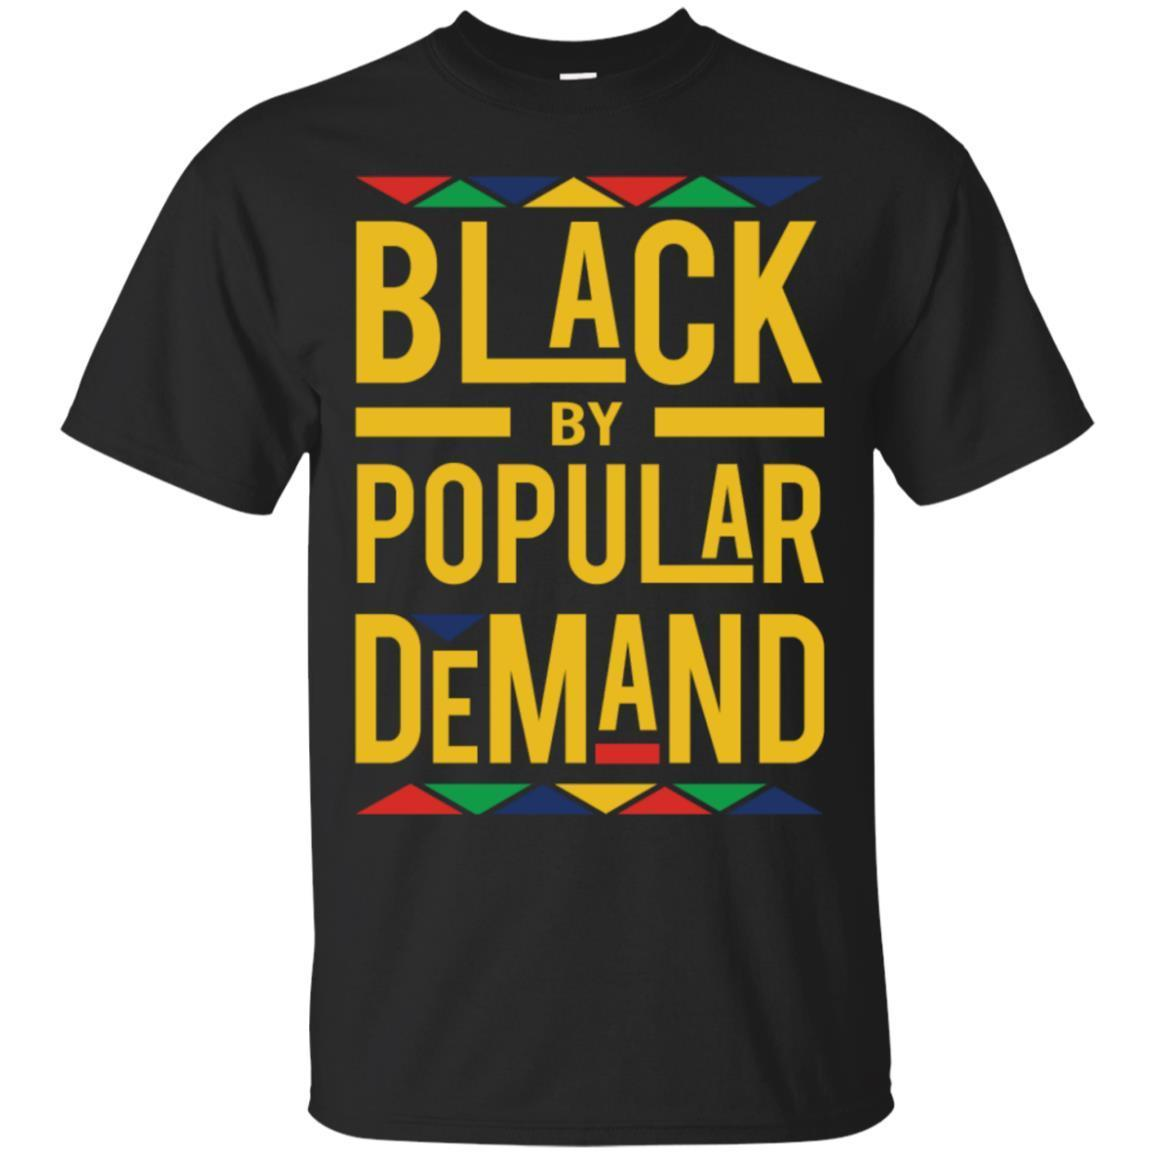 Black by Popular Demand T-Shirt